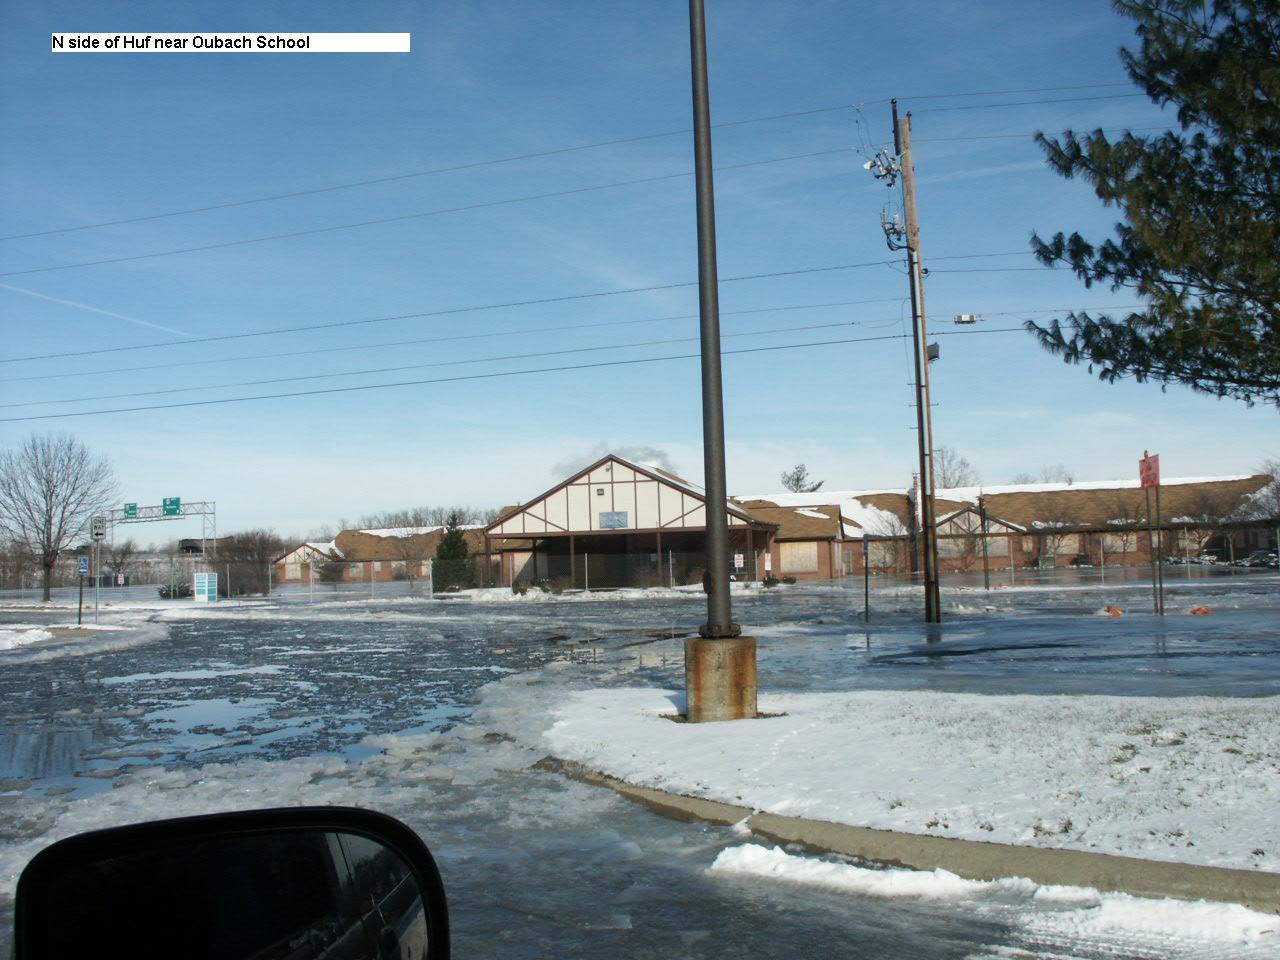 National Weather Service Advanced Hydrologic Prediction Service